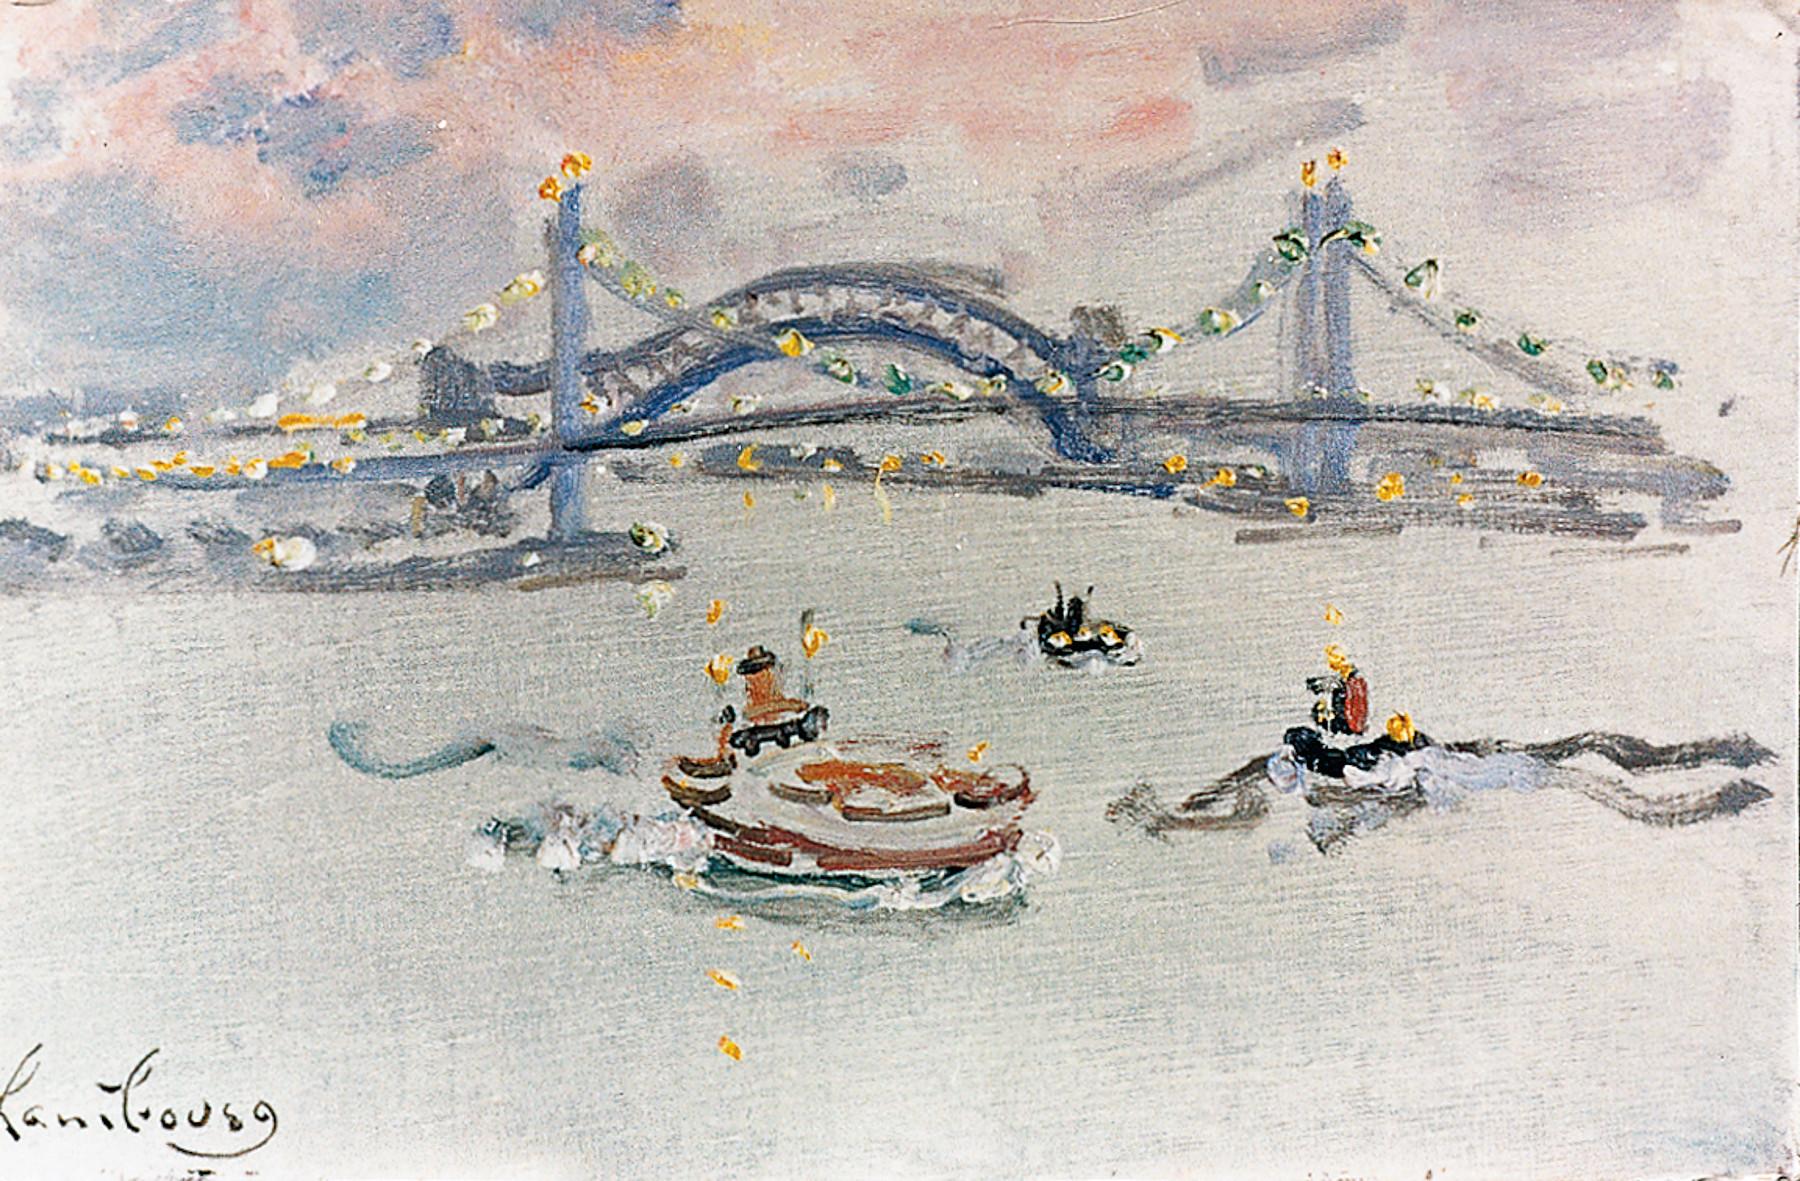 «East River, le soir au printemps»1973, 27cmx46cm, NY19